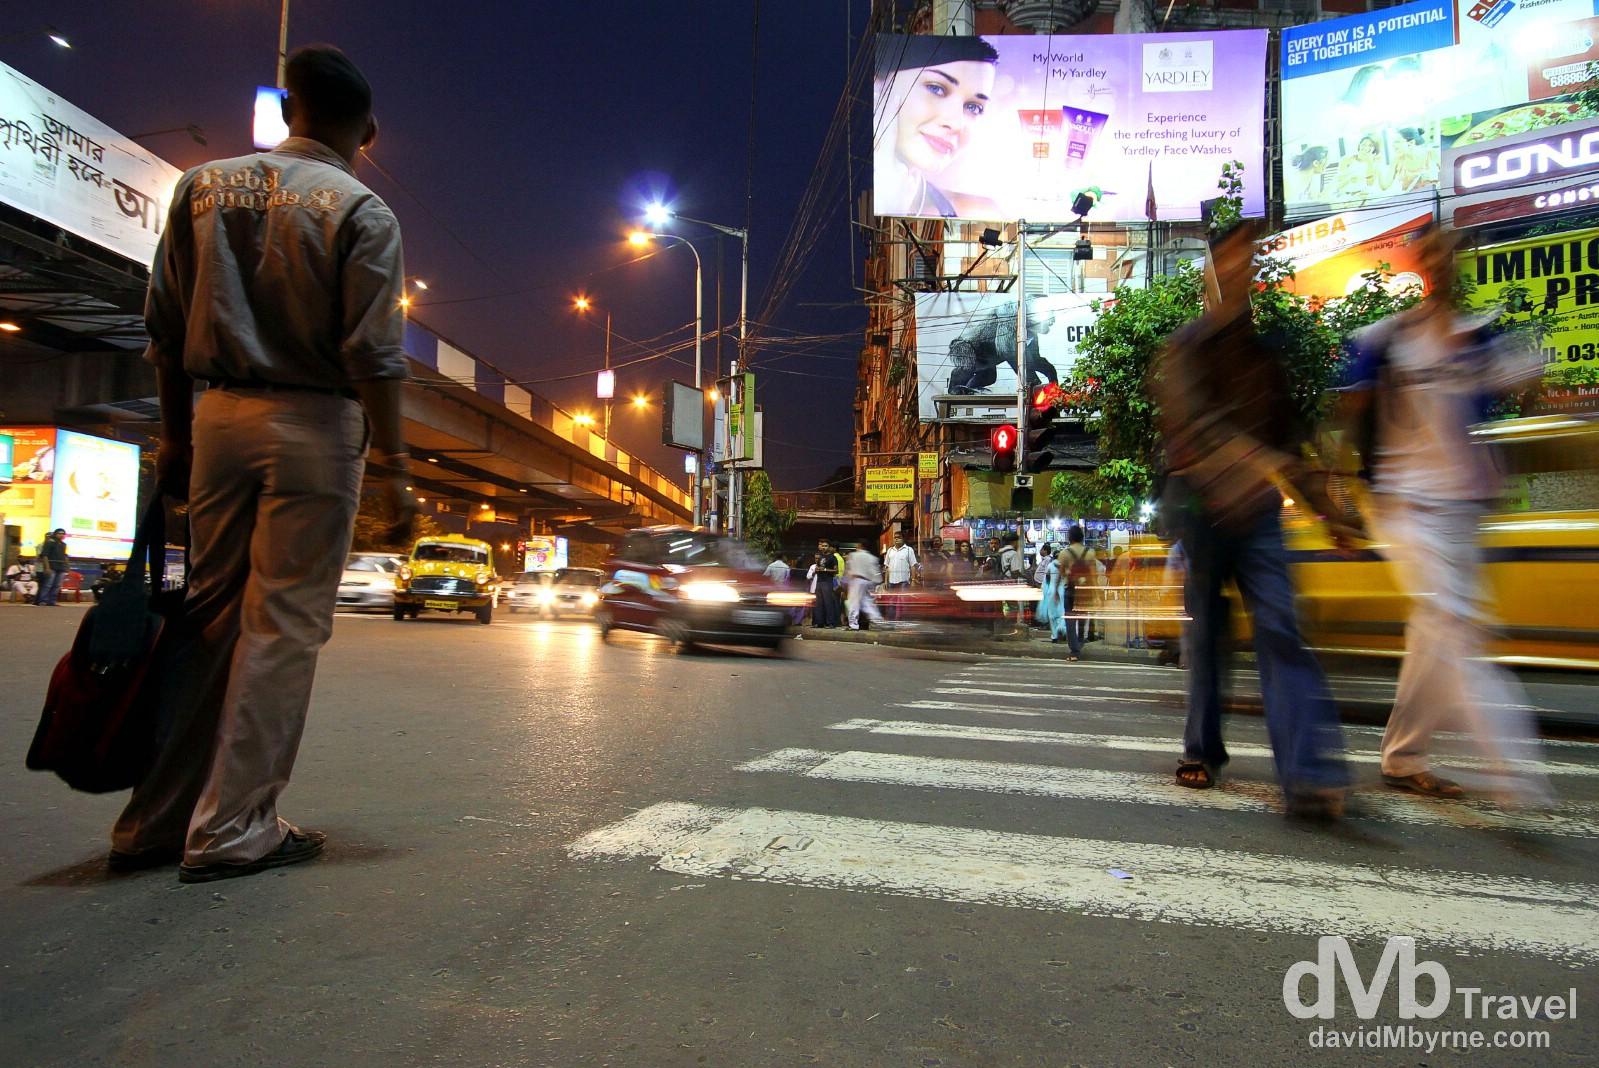 Activity at a junction on Àshutosh Mukherjee Road, Kolkata (Calcutta), West Bengal, India. October 16th 2012.